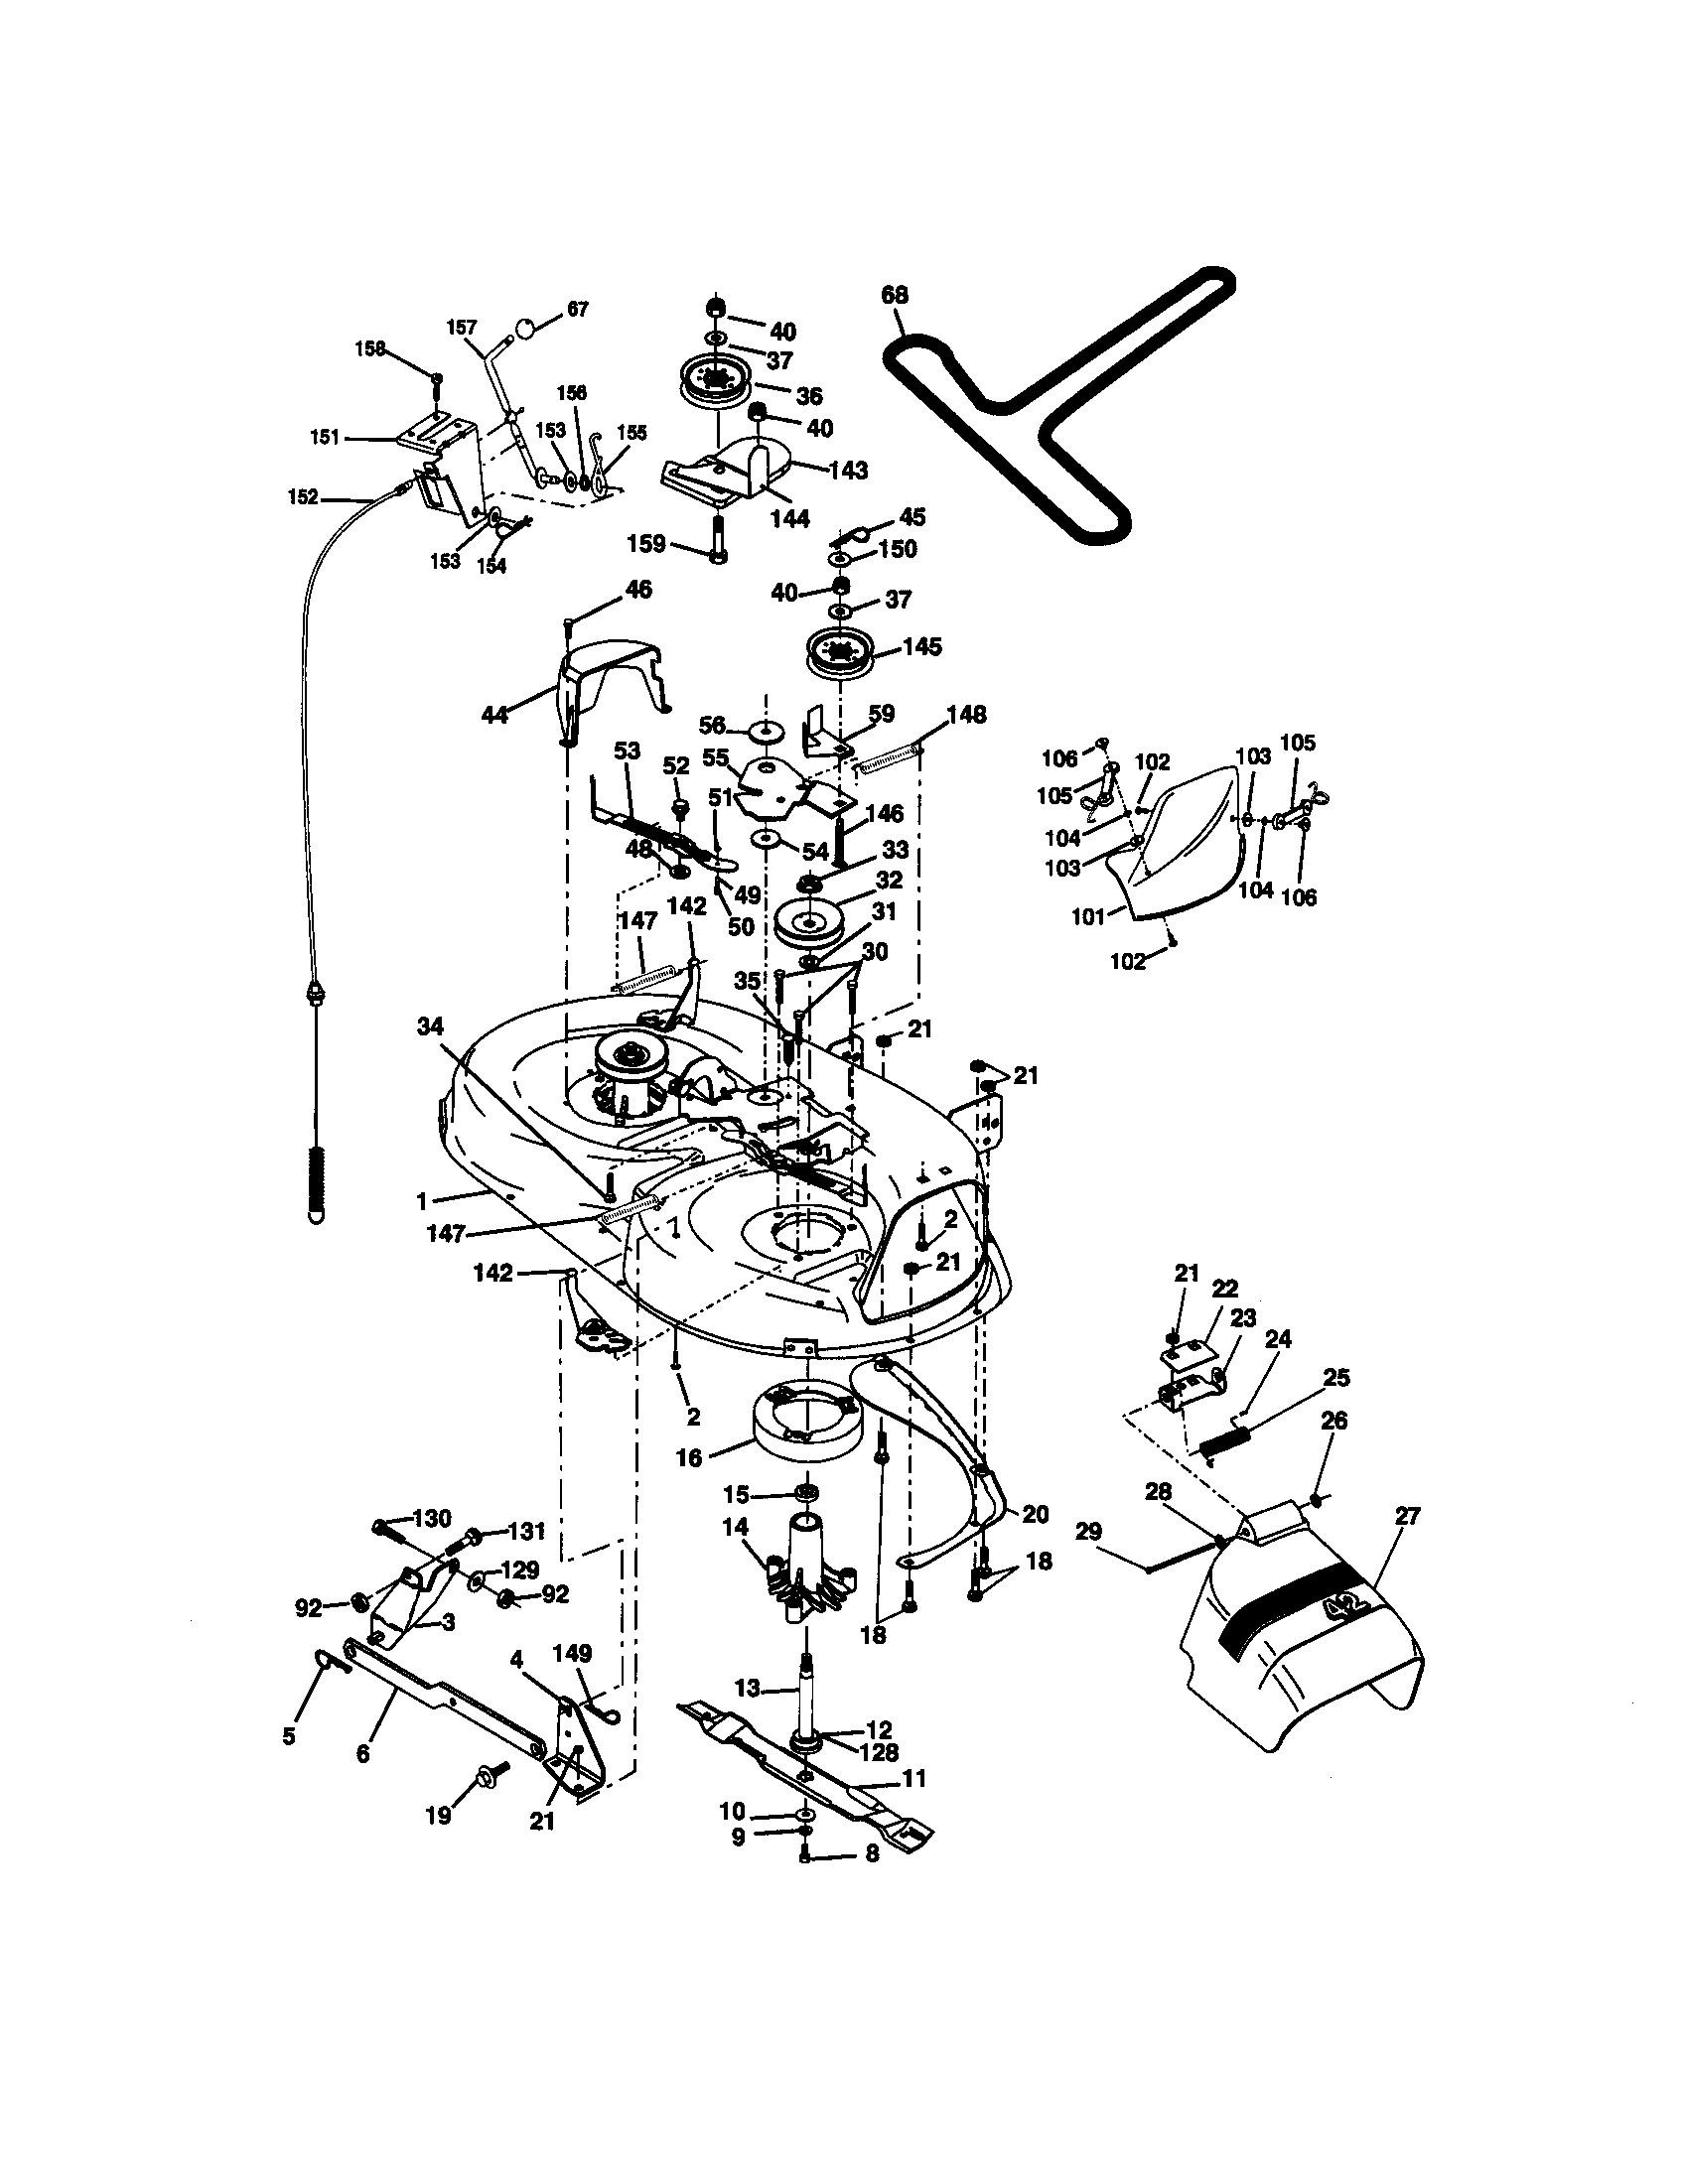 Parts Diagram Craftsman 17.5 Hp Lawn Mower 27 Craftsman Dls 3500 Parts Diagram Wiring Diagram List Of Parts Diagram Craftsman 17.5 Hp Lawn Mower